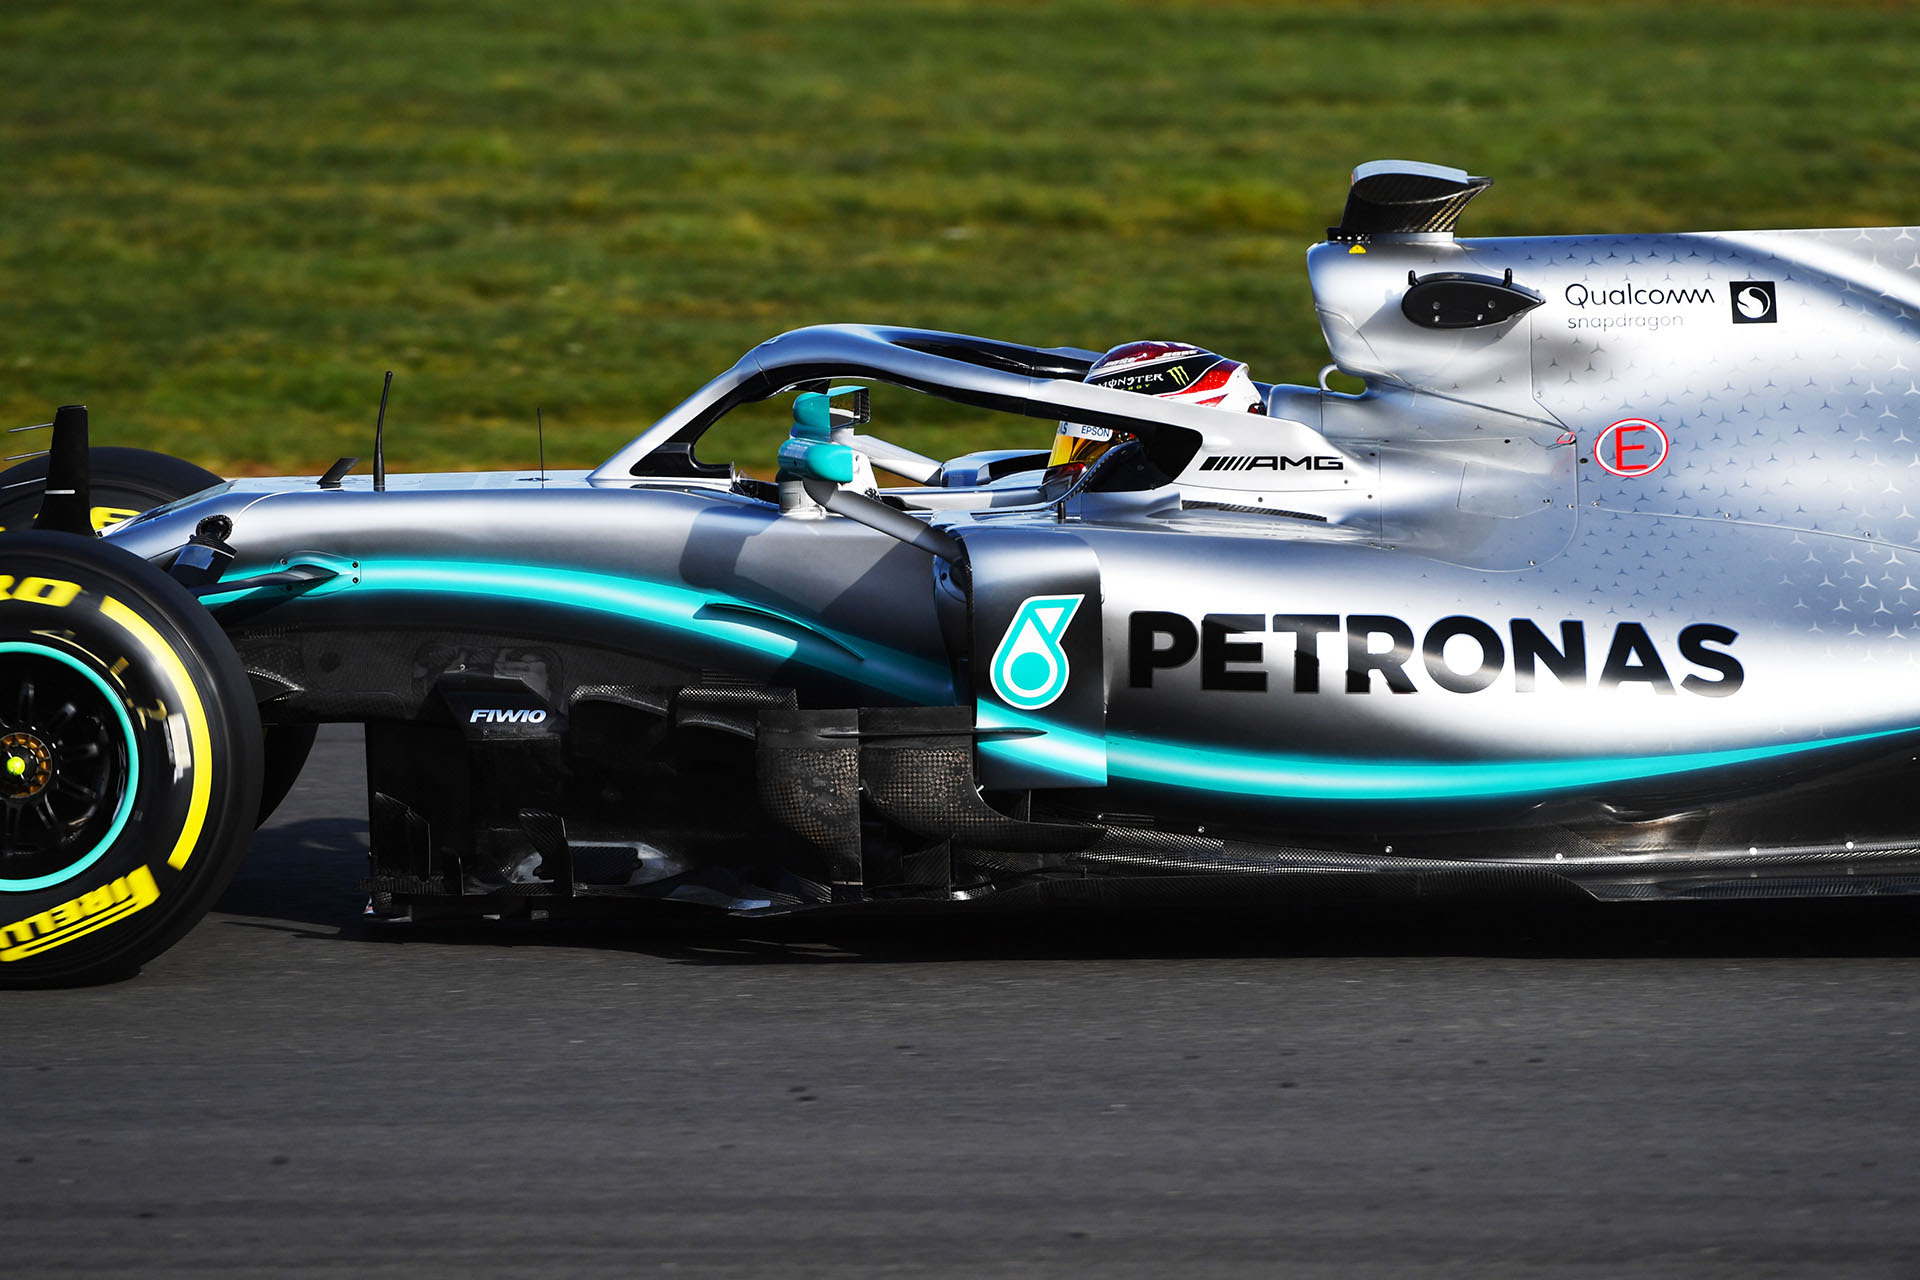 F1: Mercedes AMG Petronas Welcomes The W10 - MotorworldHype